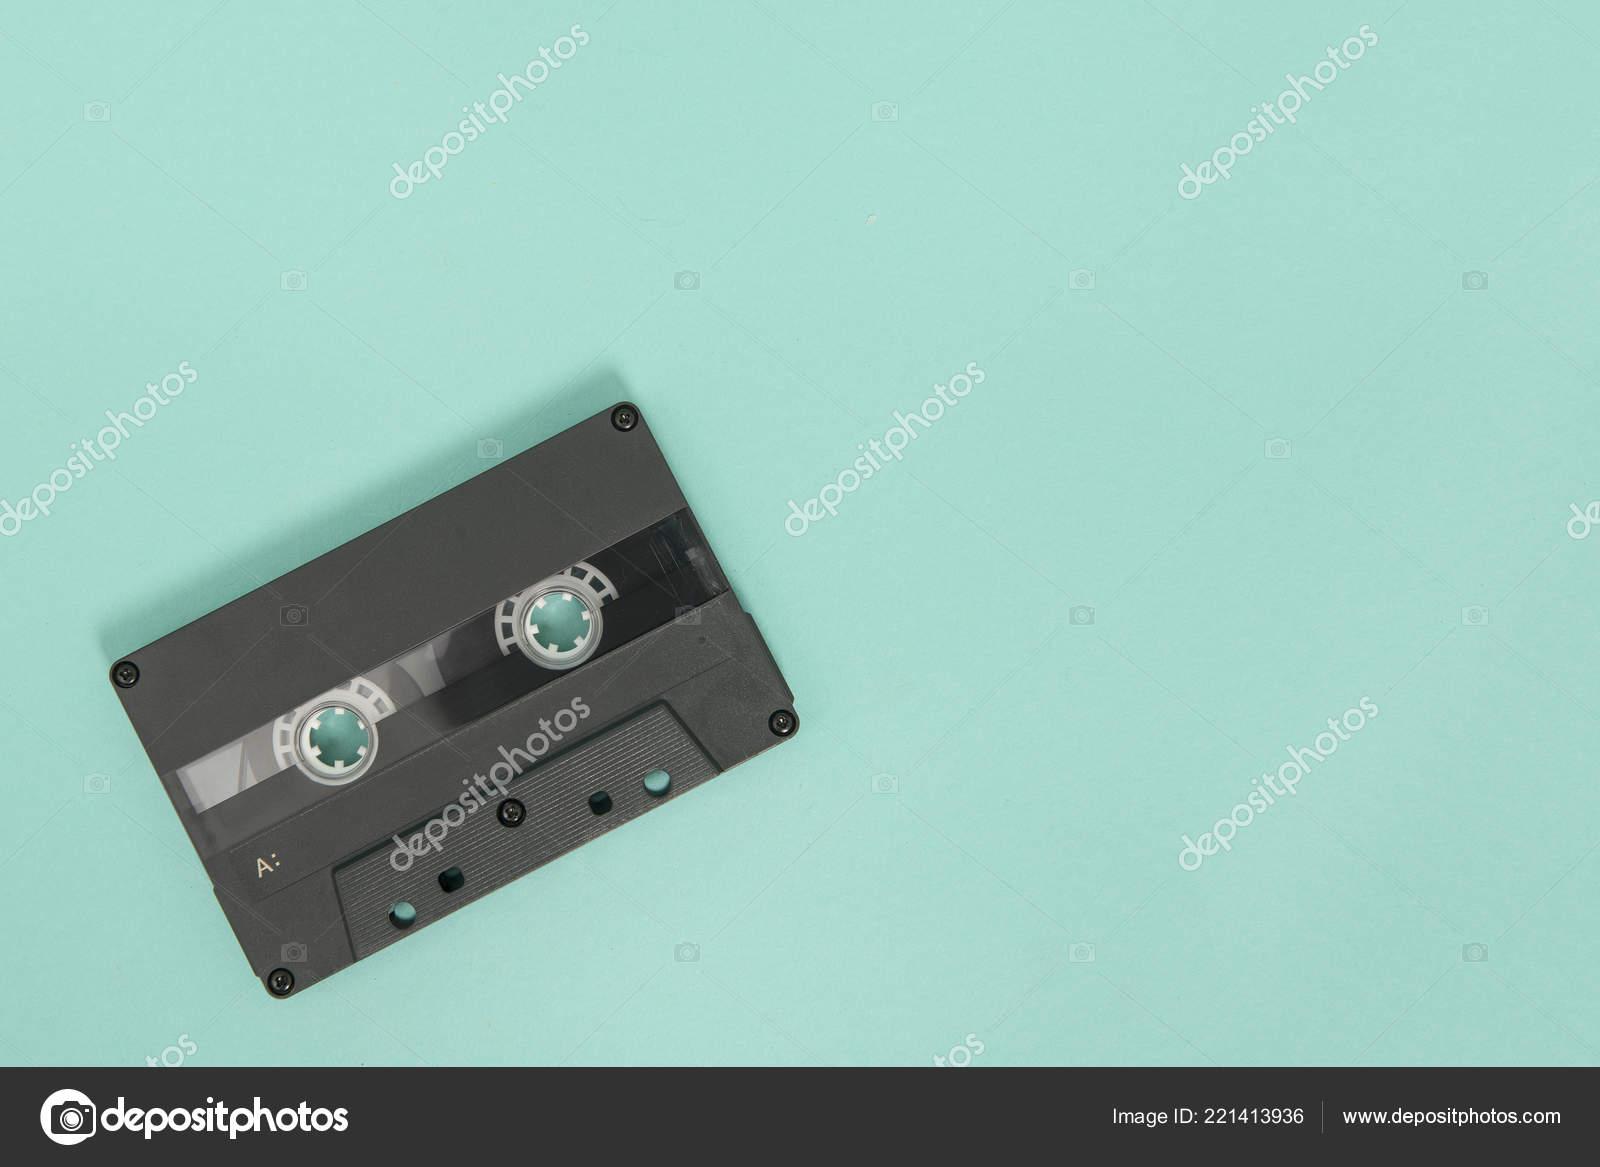 Nastro Cassetta Vuota Nera Sfondo Blu Turchese Foto Stock